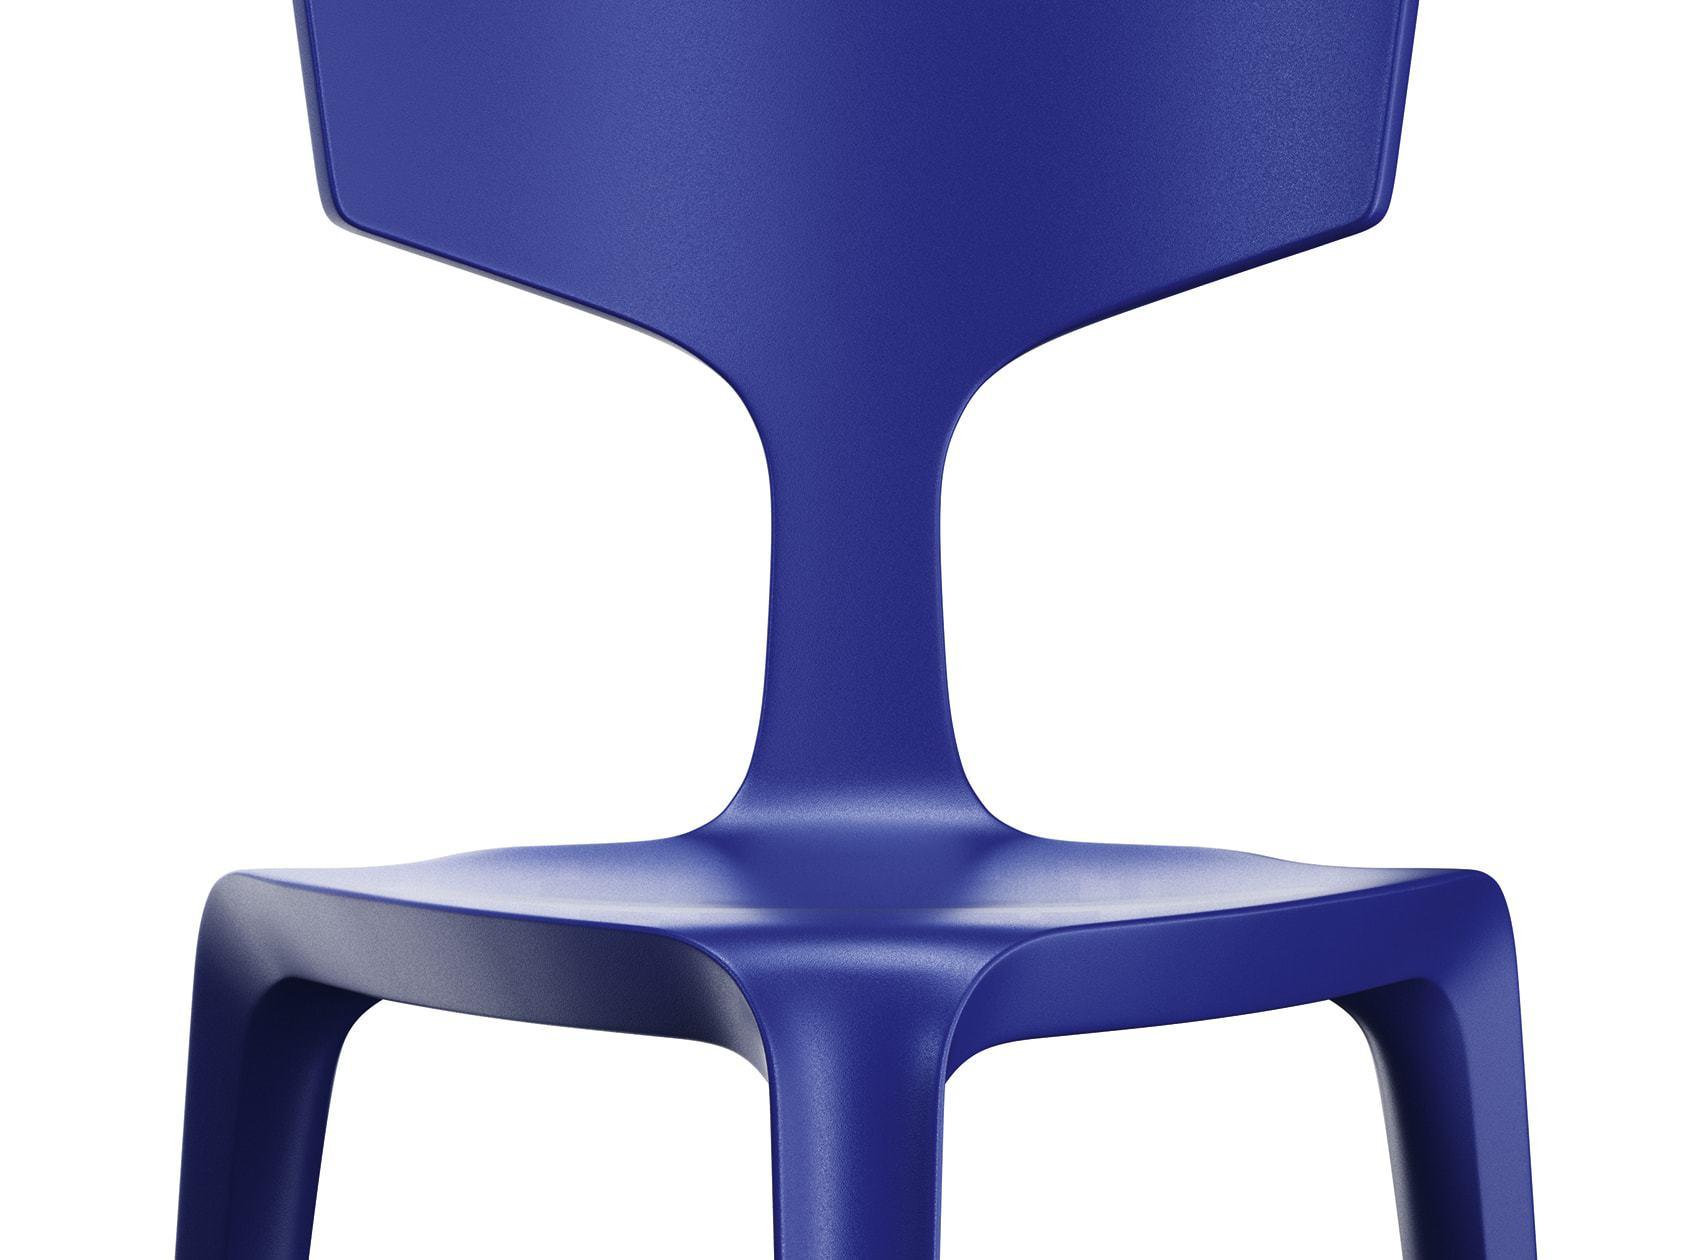 Stolička Stakki - trojnohá konštrukcia